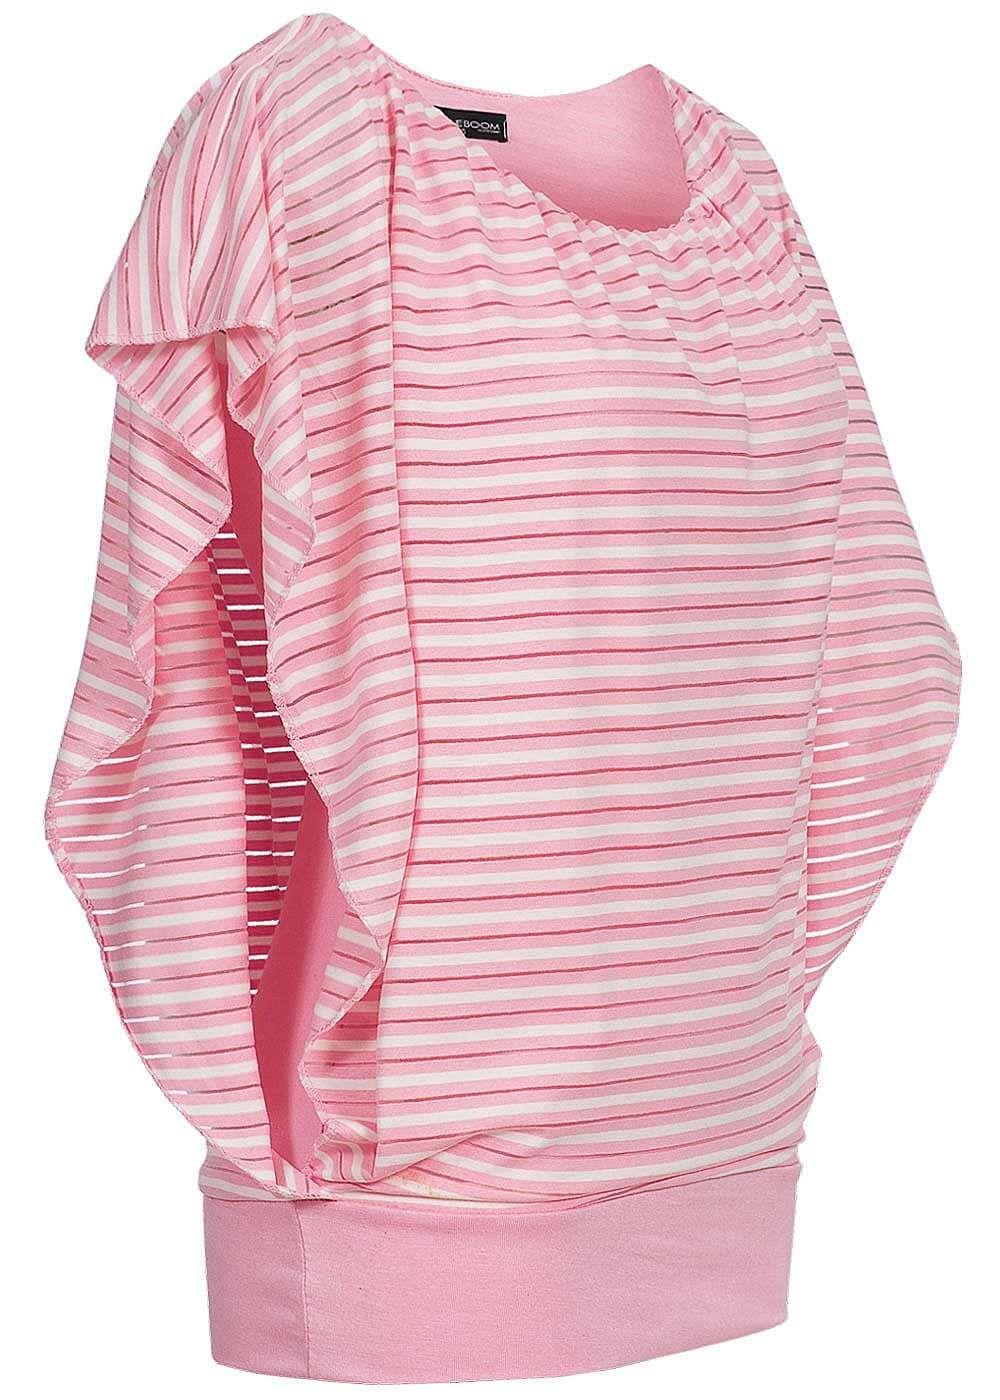 2fa4d7b91905c6 Styleboom Fashion Damen 2in1 Shirt U-Boot Ausschnitt gestreift rosa -  77onlineshop